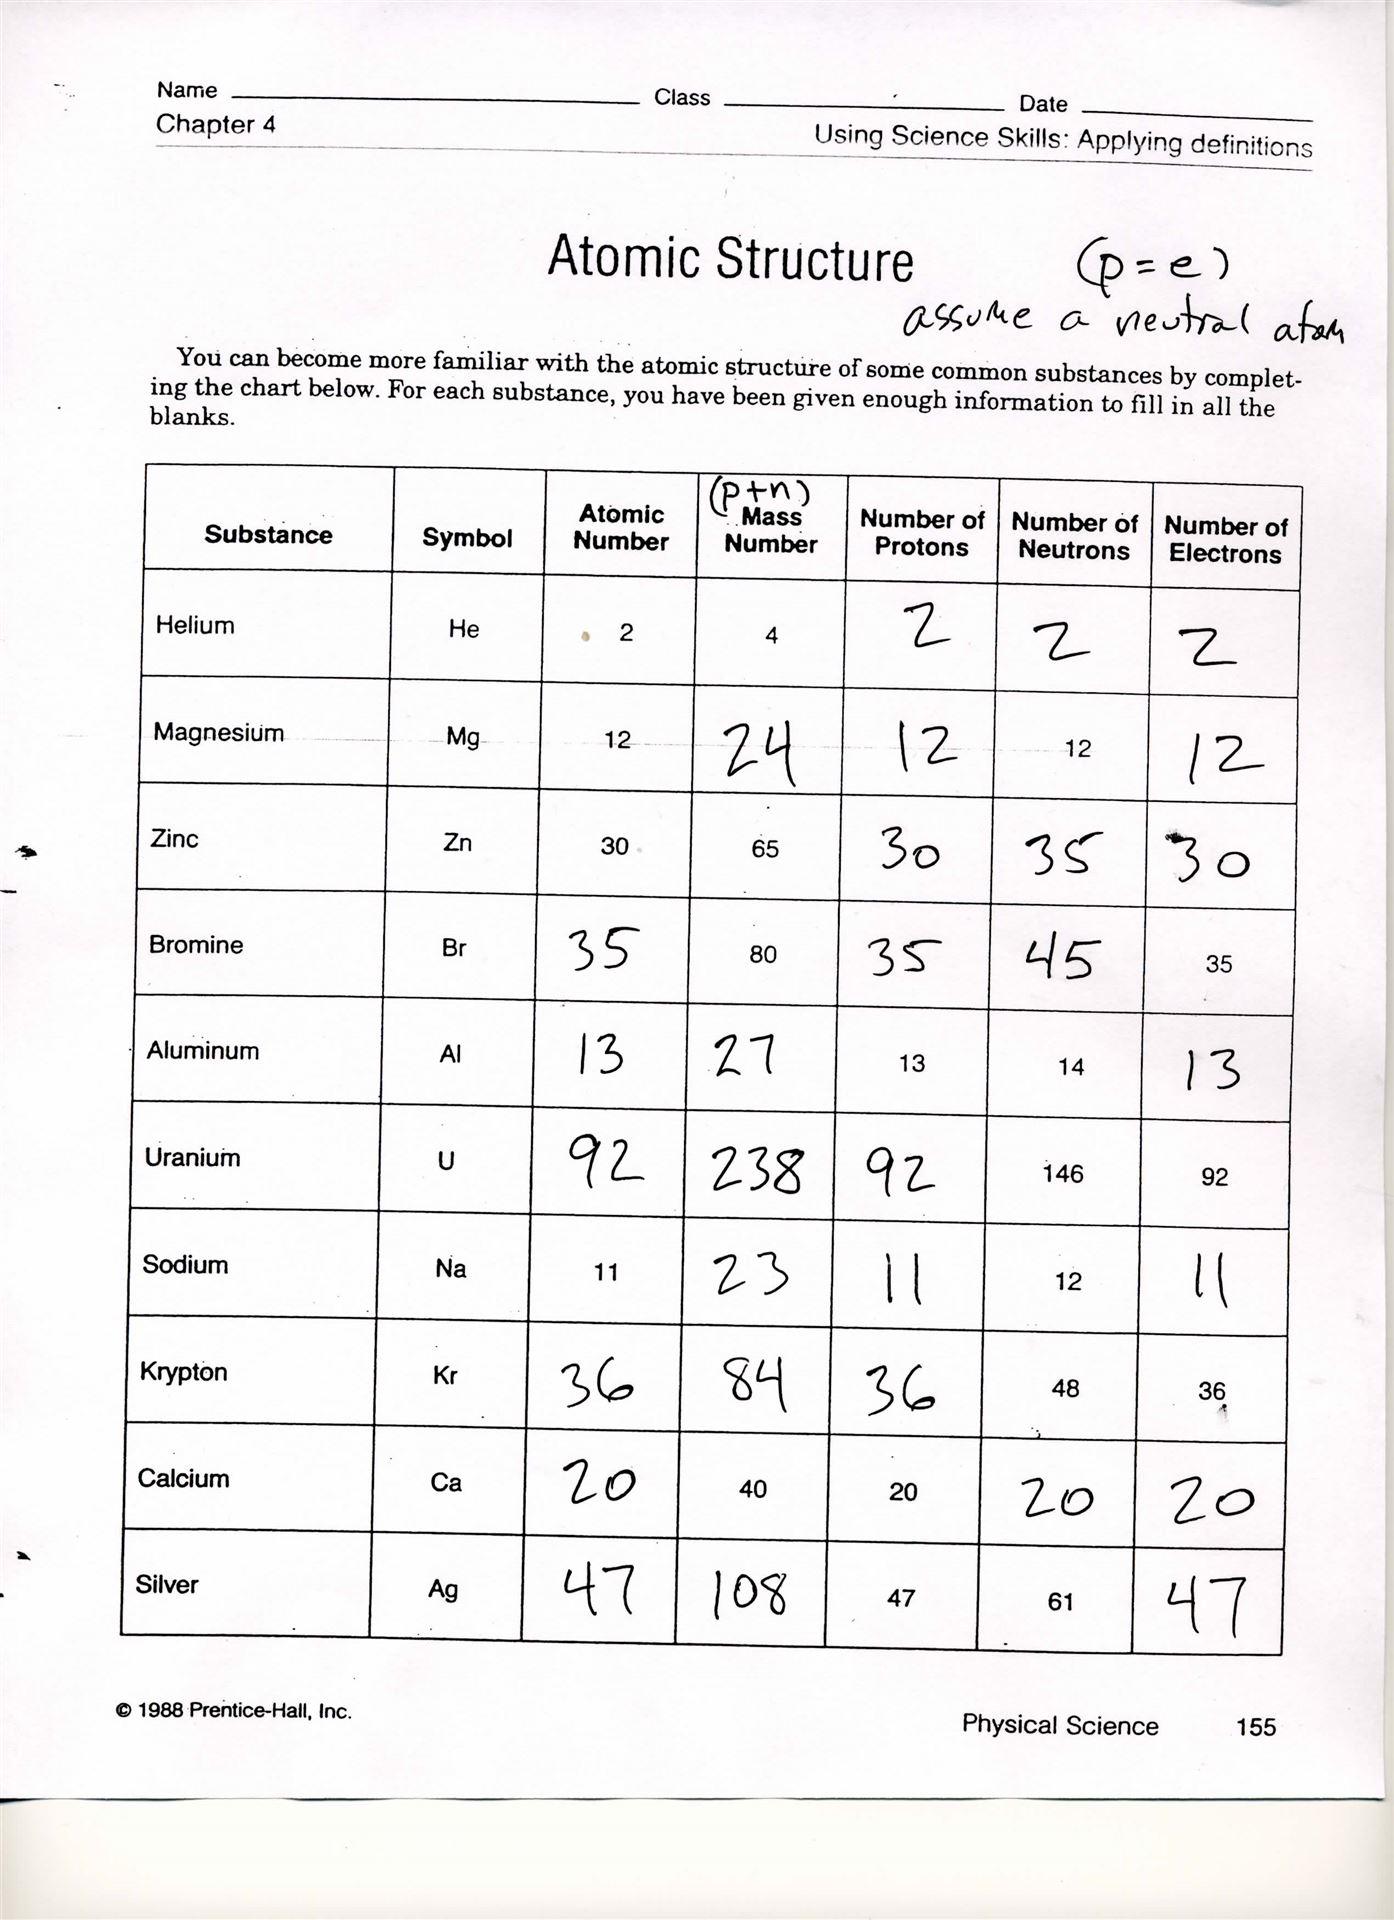 47 Bohr Model Worksheet Answers, Bohr Model Worksheet Answers